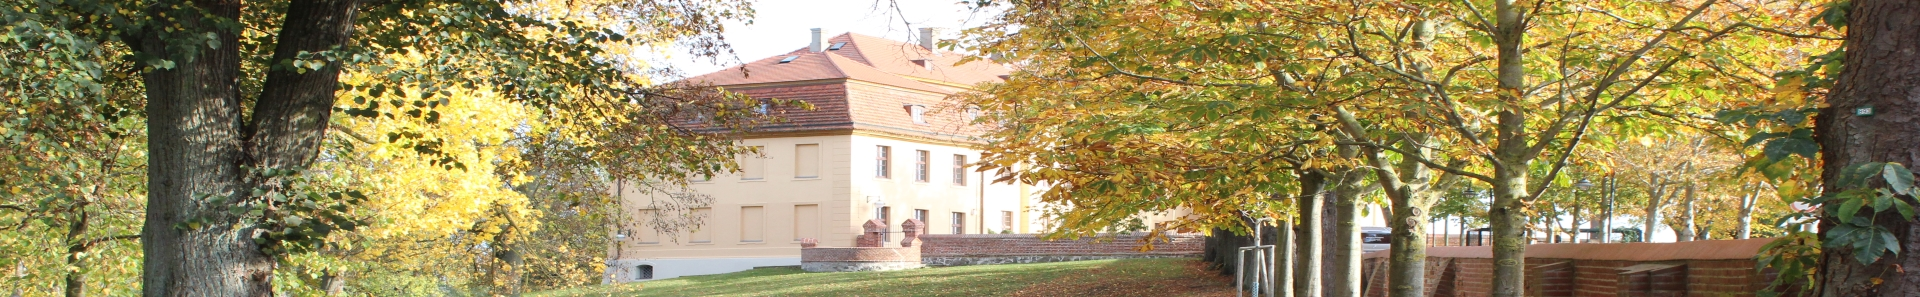 Banner Schlossgarten im Herbst